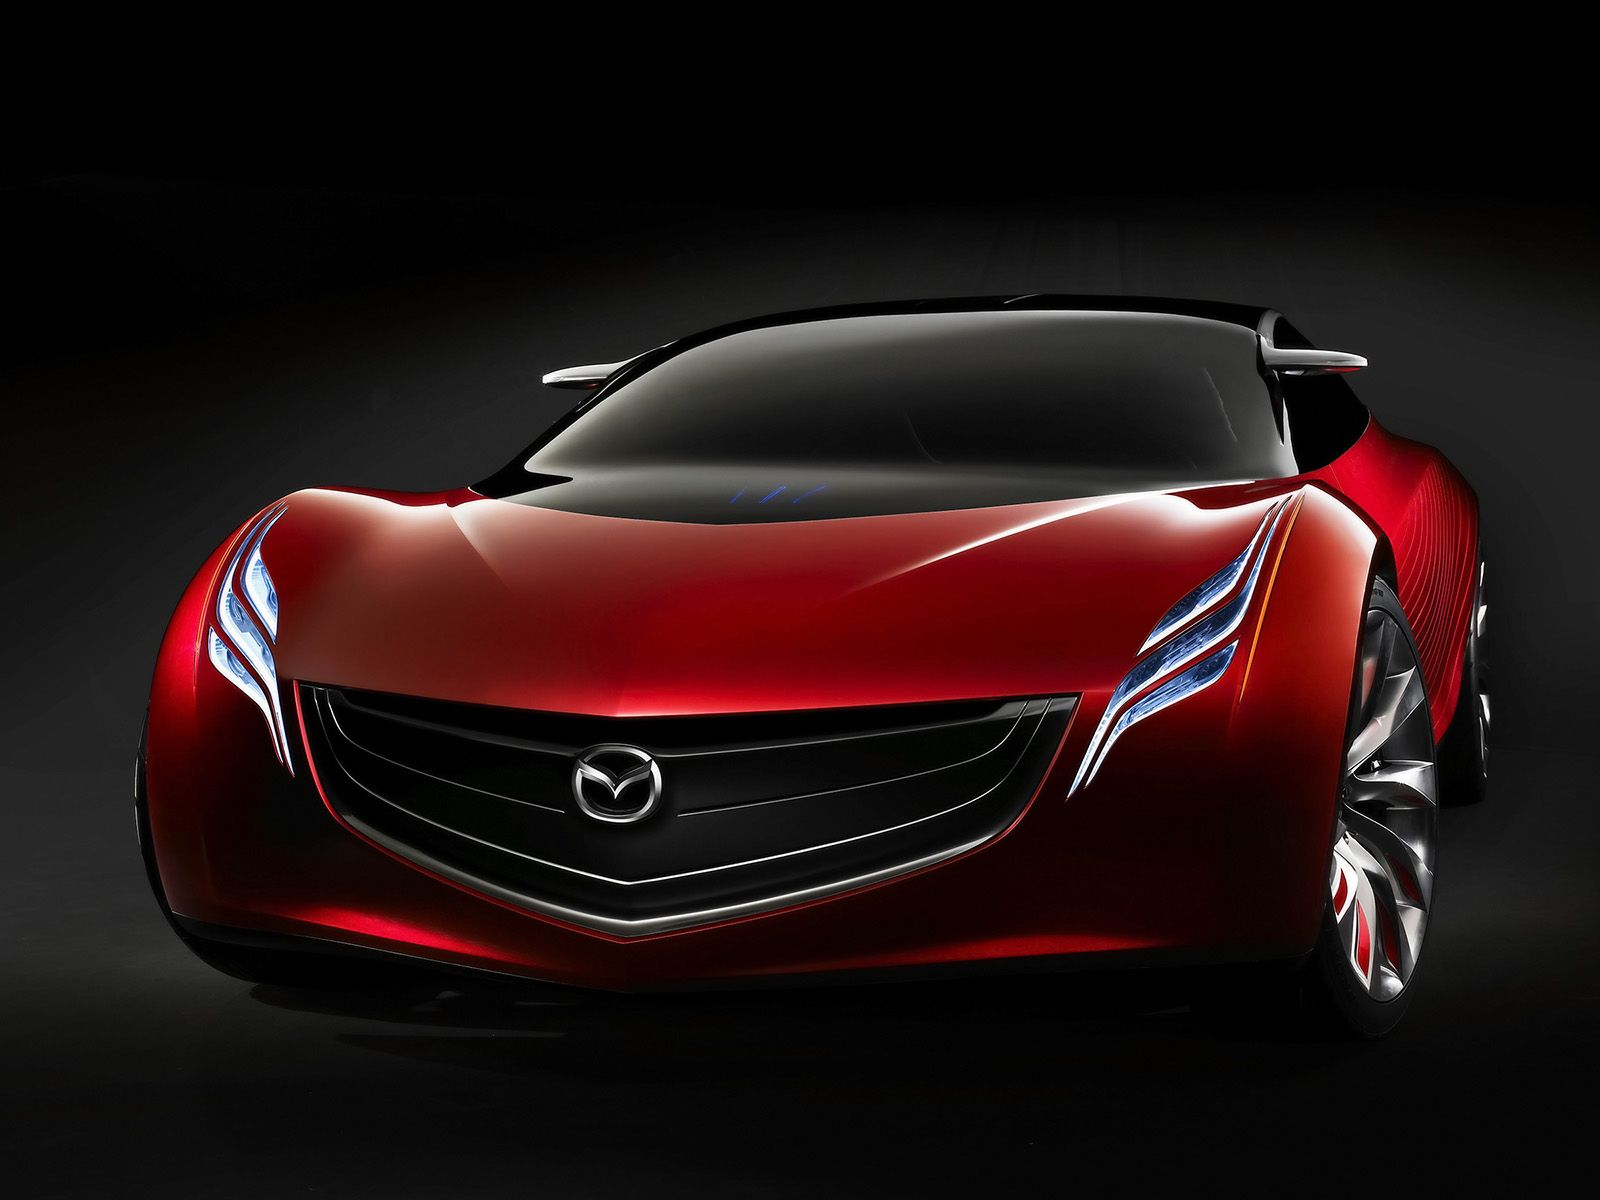 Mazda Ryuga Concept Front Low Angle Wallpaper 1600x1200